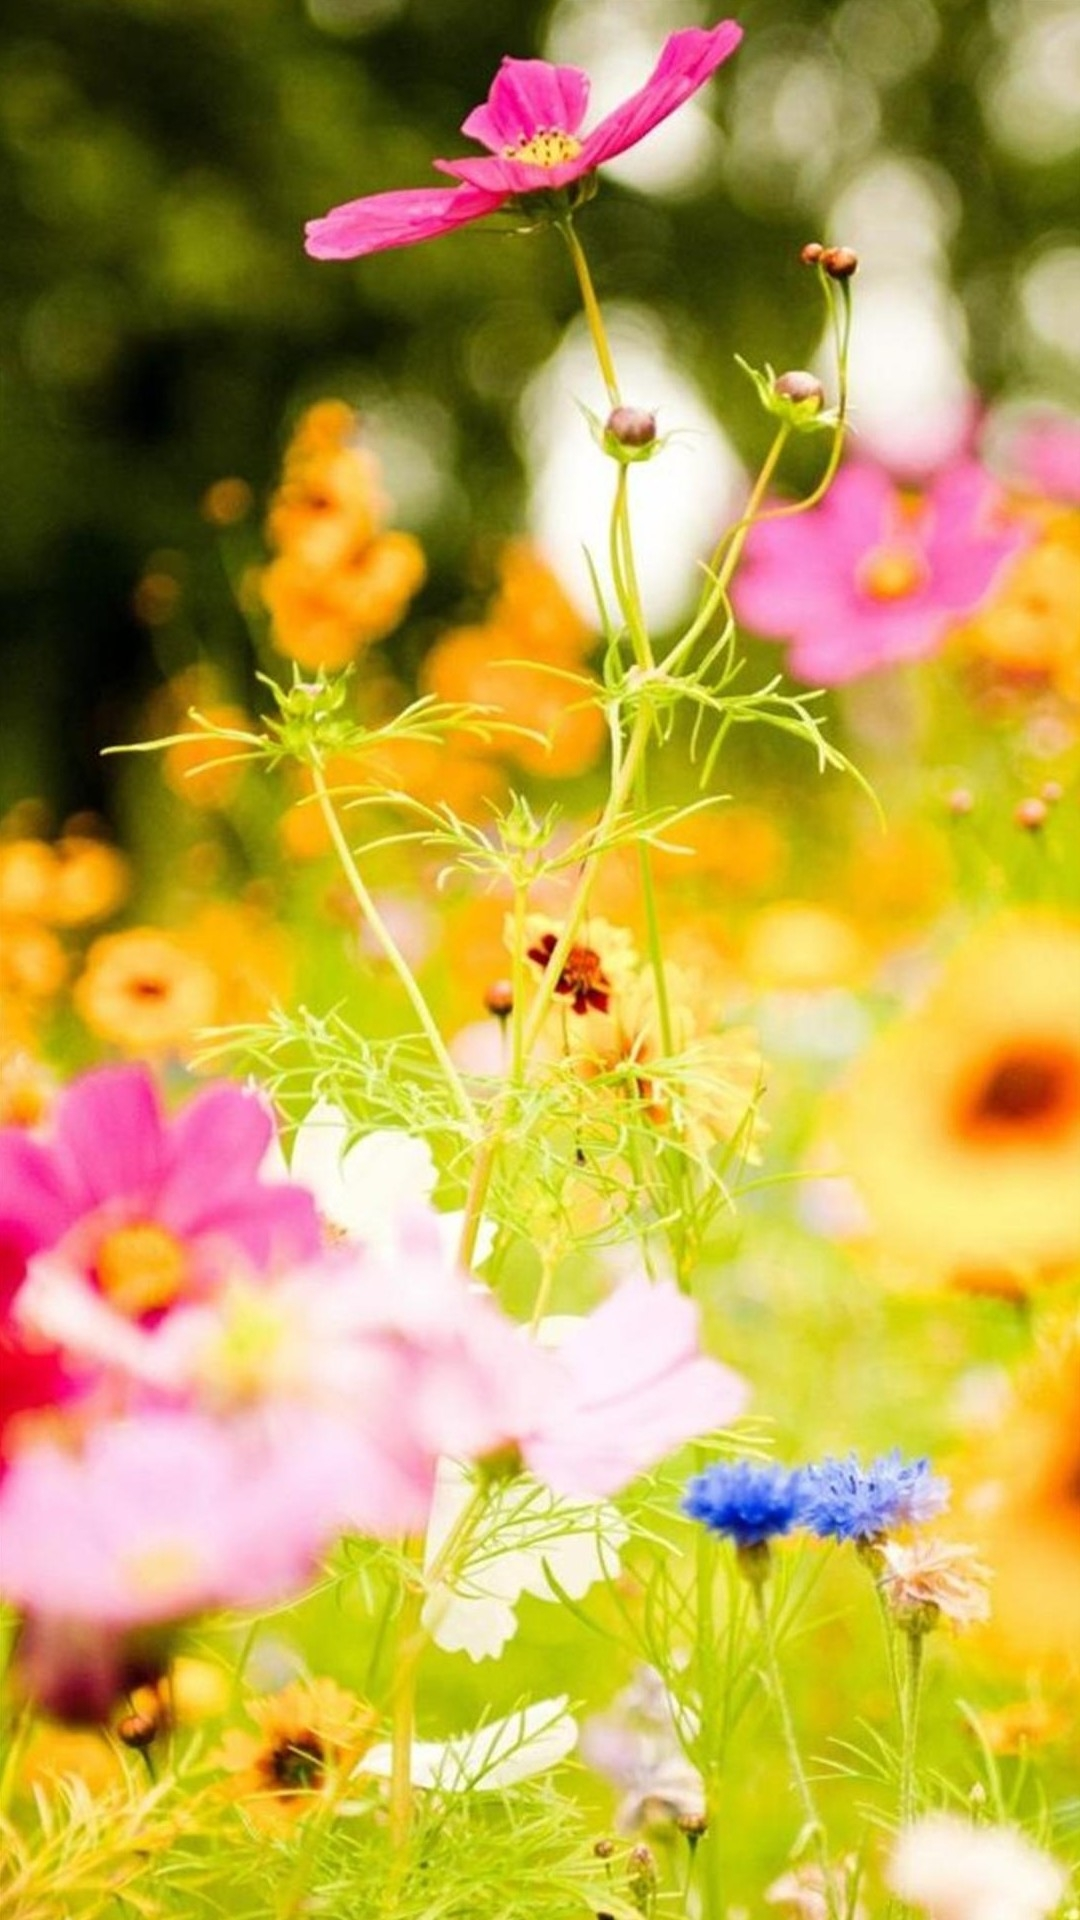 Spring Flower Garden Iphone Wallpaper